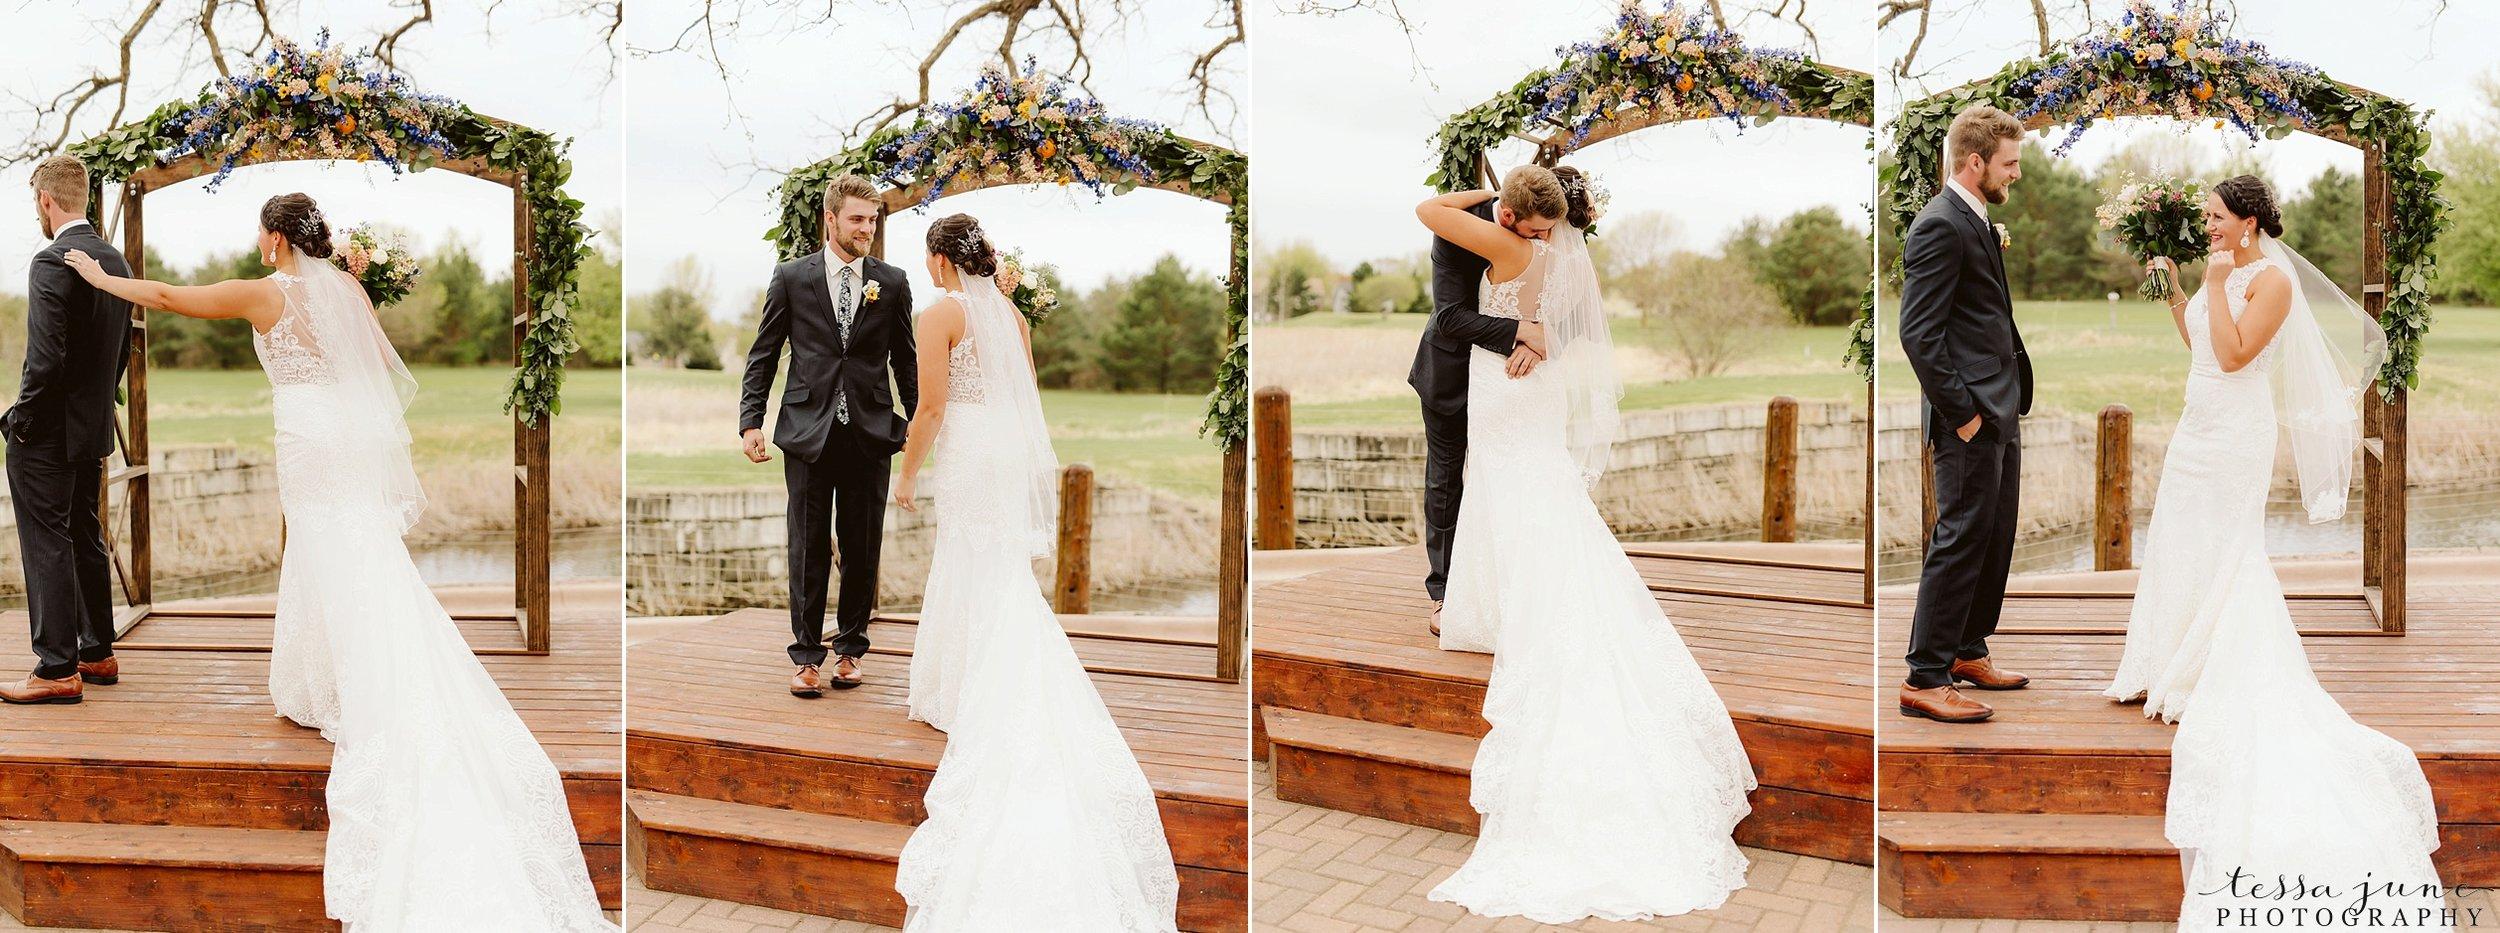 The-grands-at-mulligans-wedding-sartell-minnesota-spring-floral-spring-garden-wedding-39.jpg